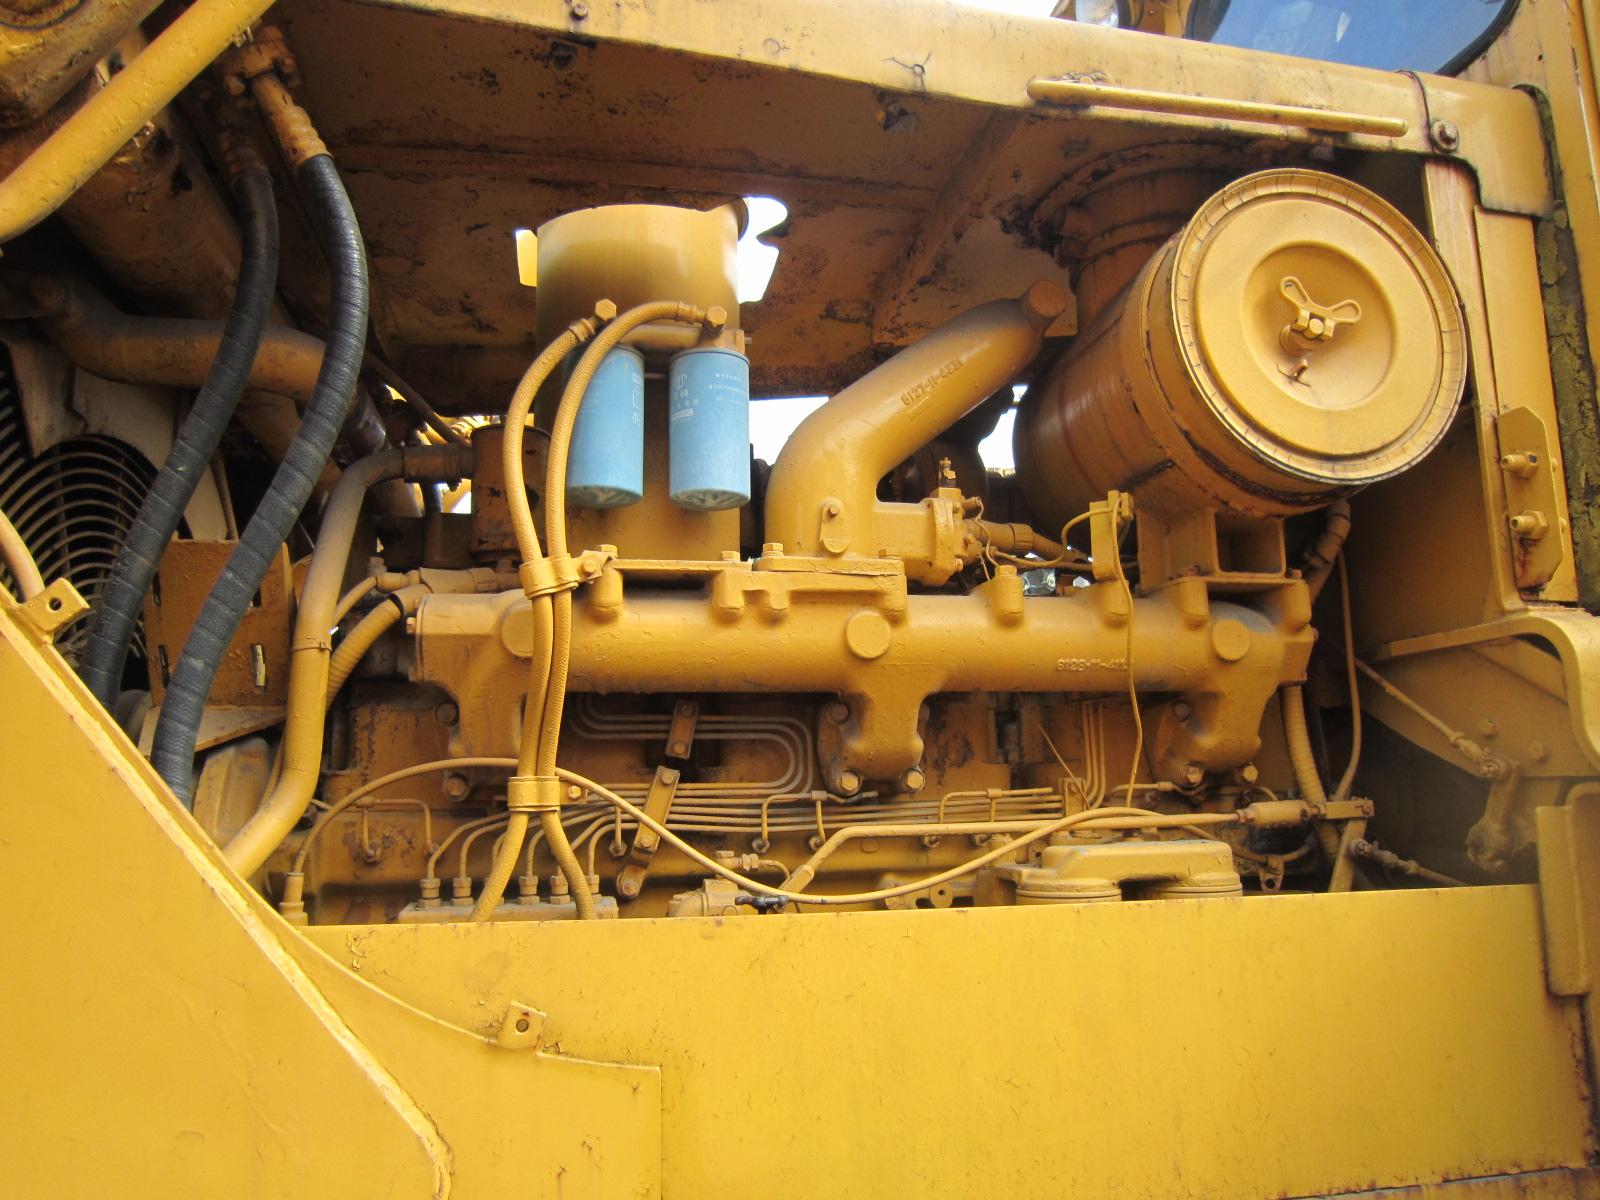 Used Komatsu D155A Bulldozer Used Japan Komatsu D155A1 Bulldozers hot sale